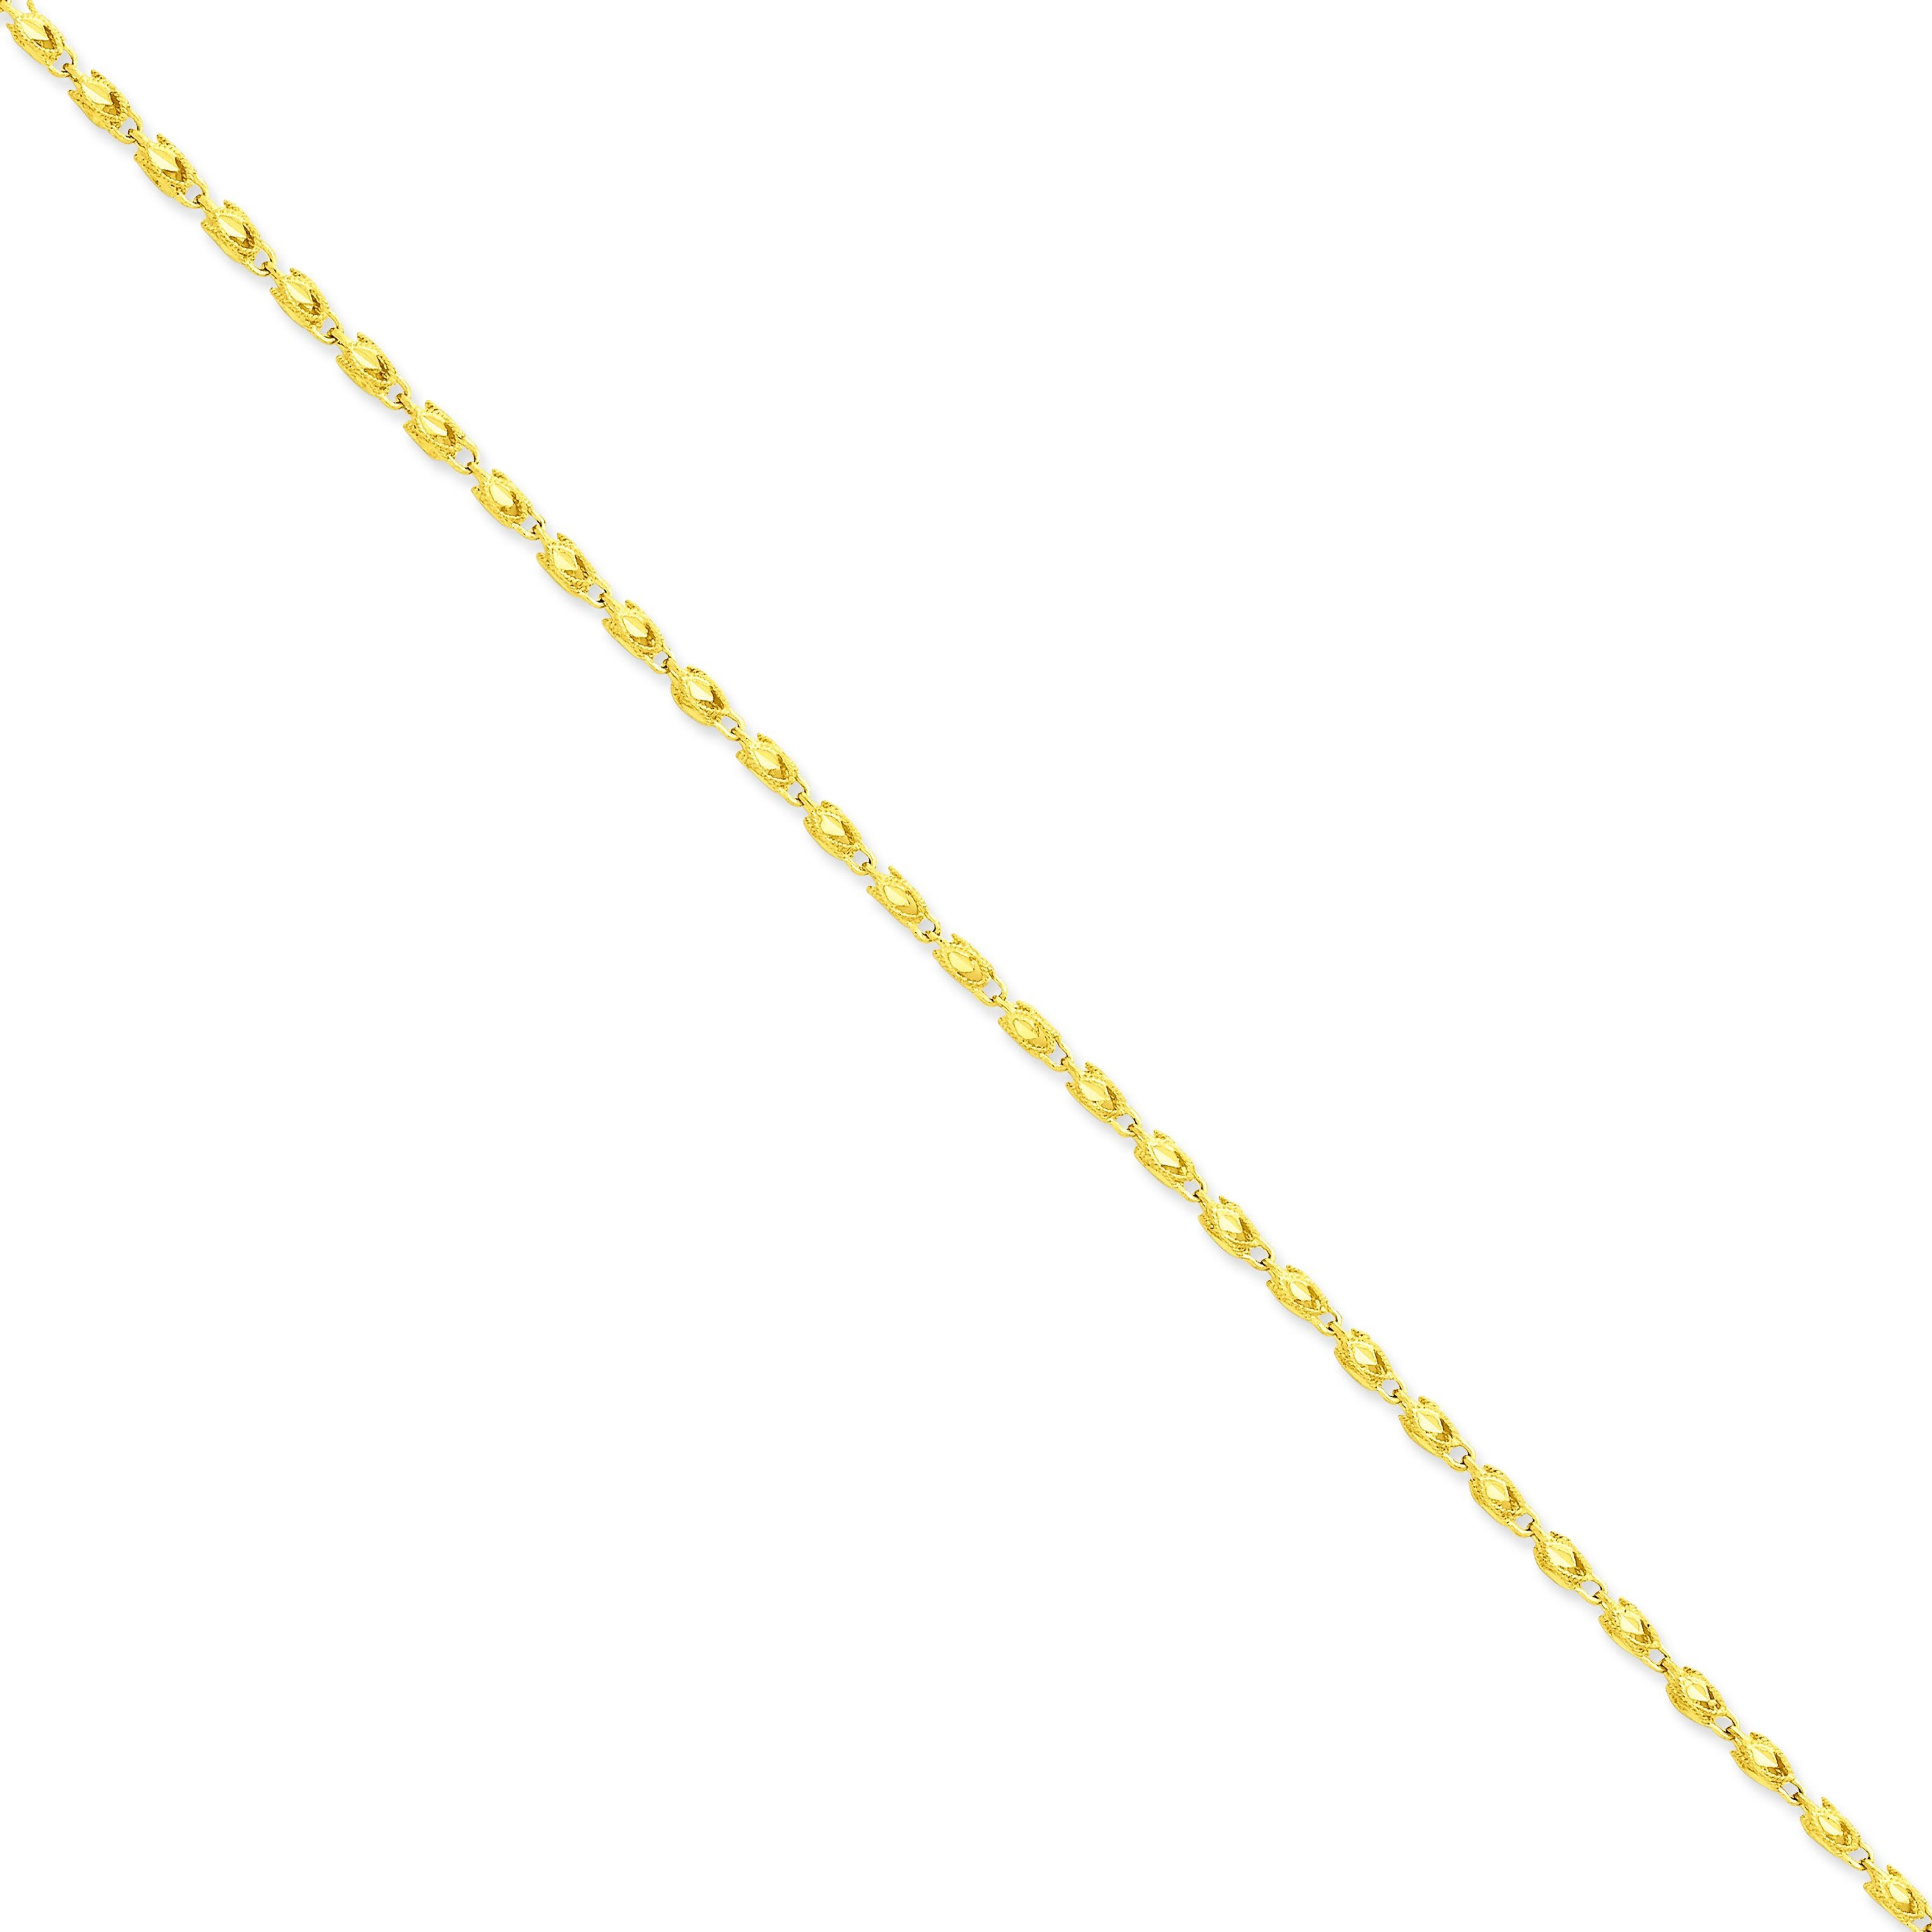 14k Yellow Gold 8 inch 2.50 mm Marquise Fancy Chain Bracelet